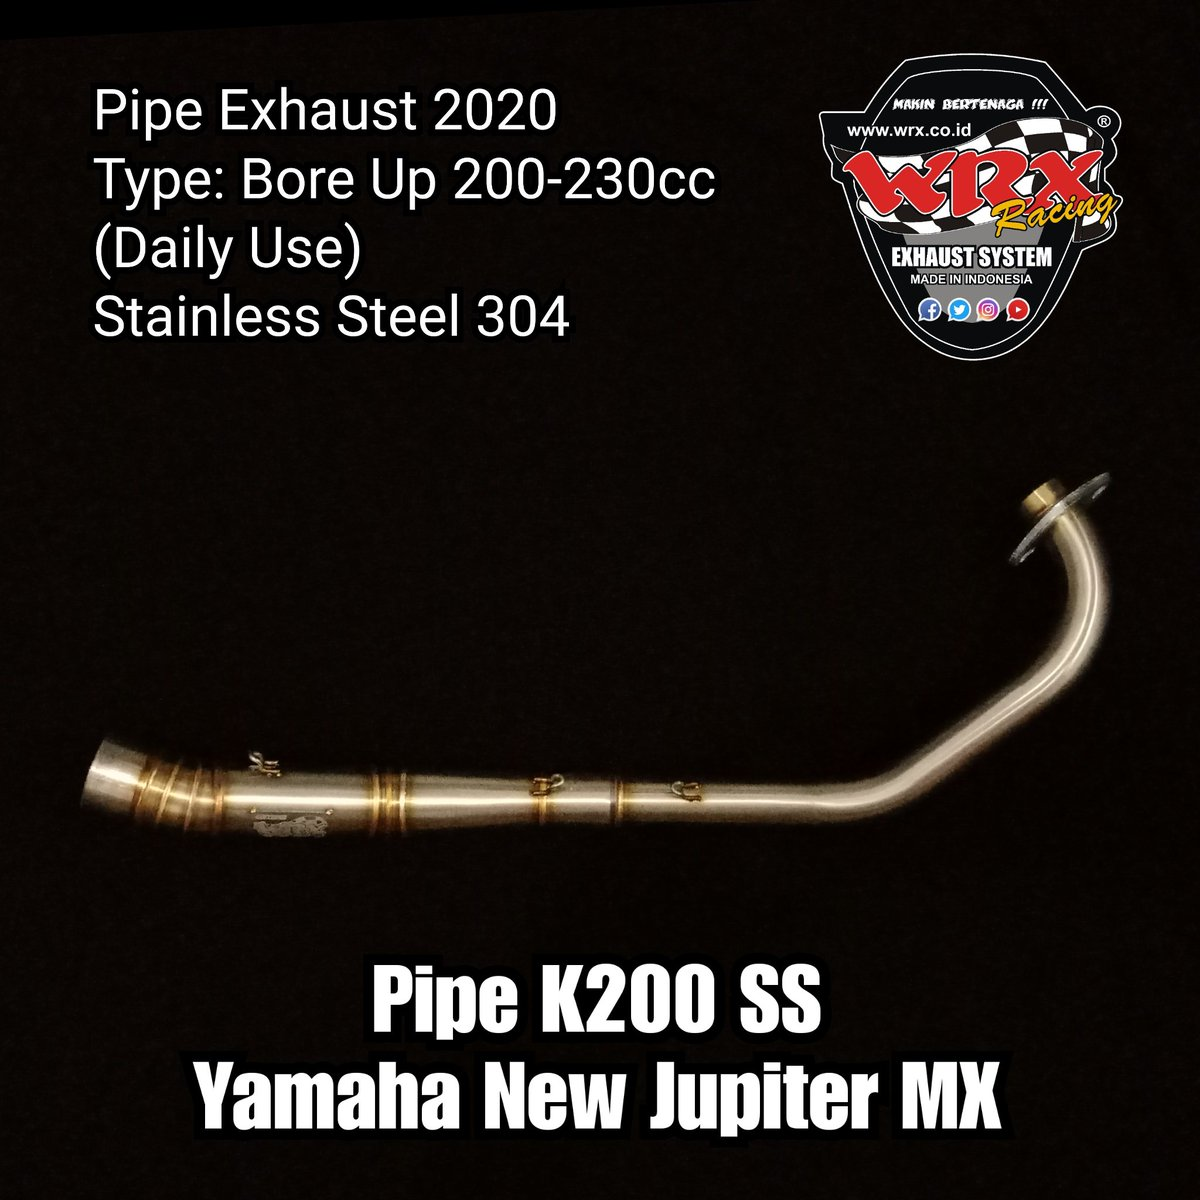 Pipe K200 SS Yamaha New Jupiter MX  Pipa knalpot tipe mesin Bore Up Harian 200-230cc (Inlet 50mm)  Stainless Steel 304  #newjupitermx #njmx #lc135 #k200pic.twitter.com/c1bXjGfODm